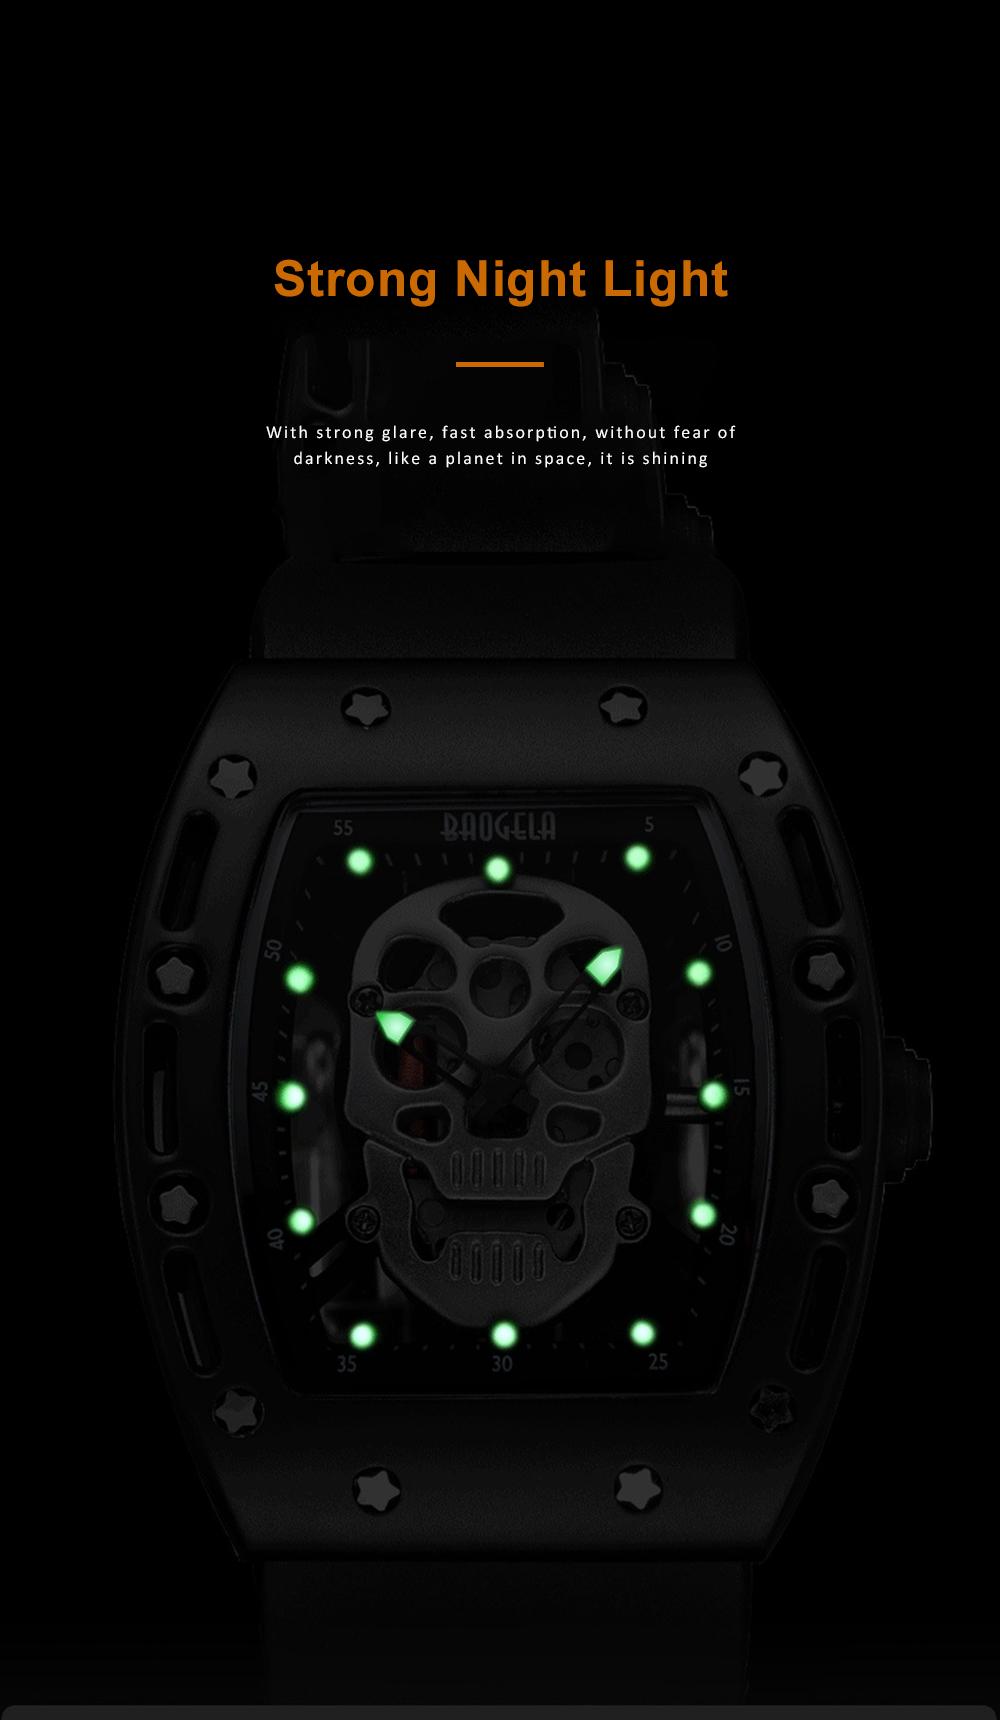 2020 Hot Sell Watches Men Luxury Brand Automatic Silicone Shantou Hollow Men's Quartz Watch Waterproof Movement 2